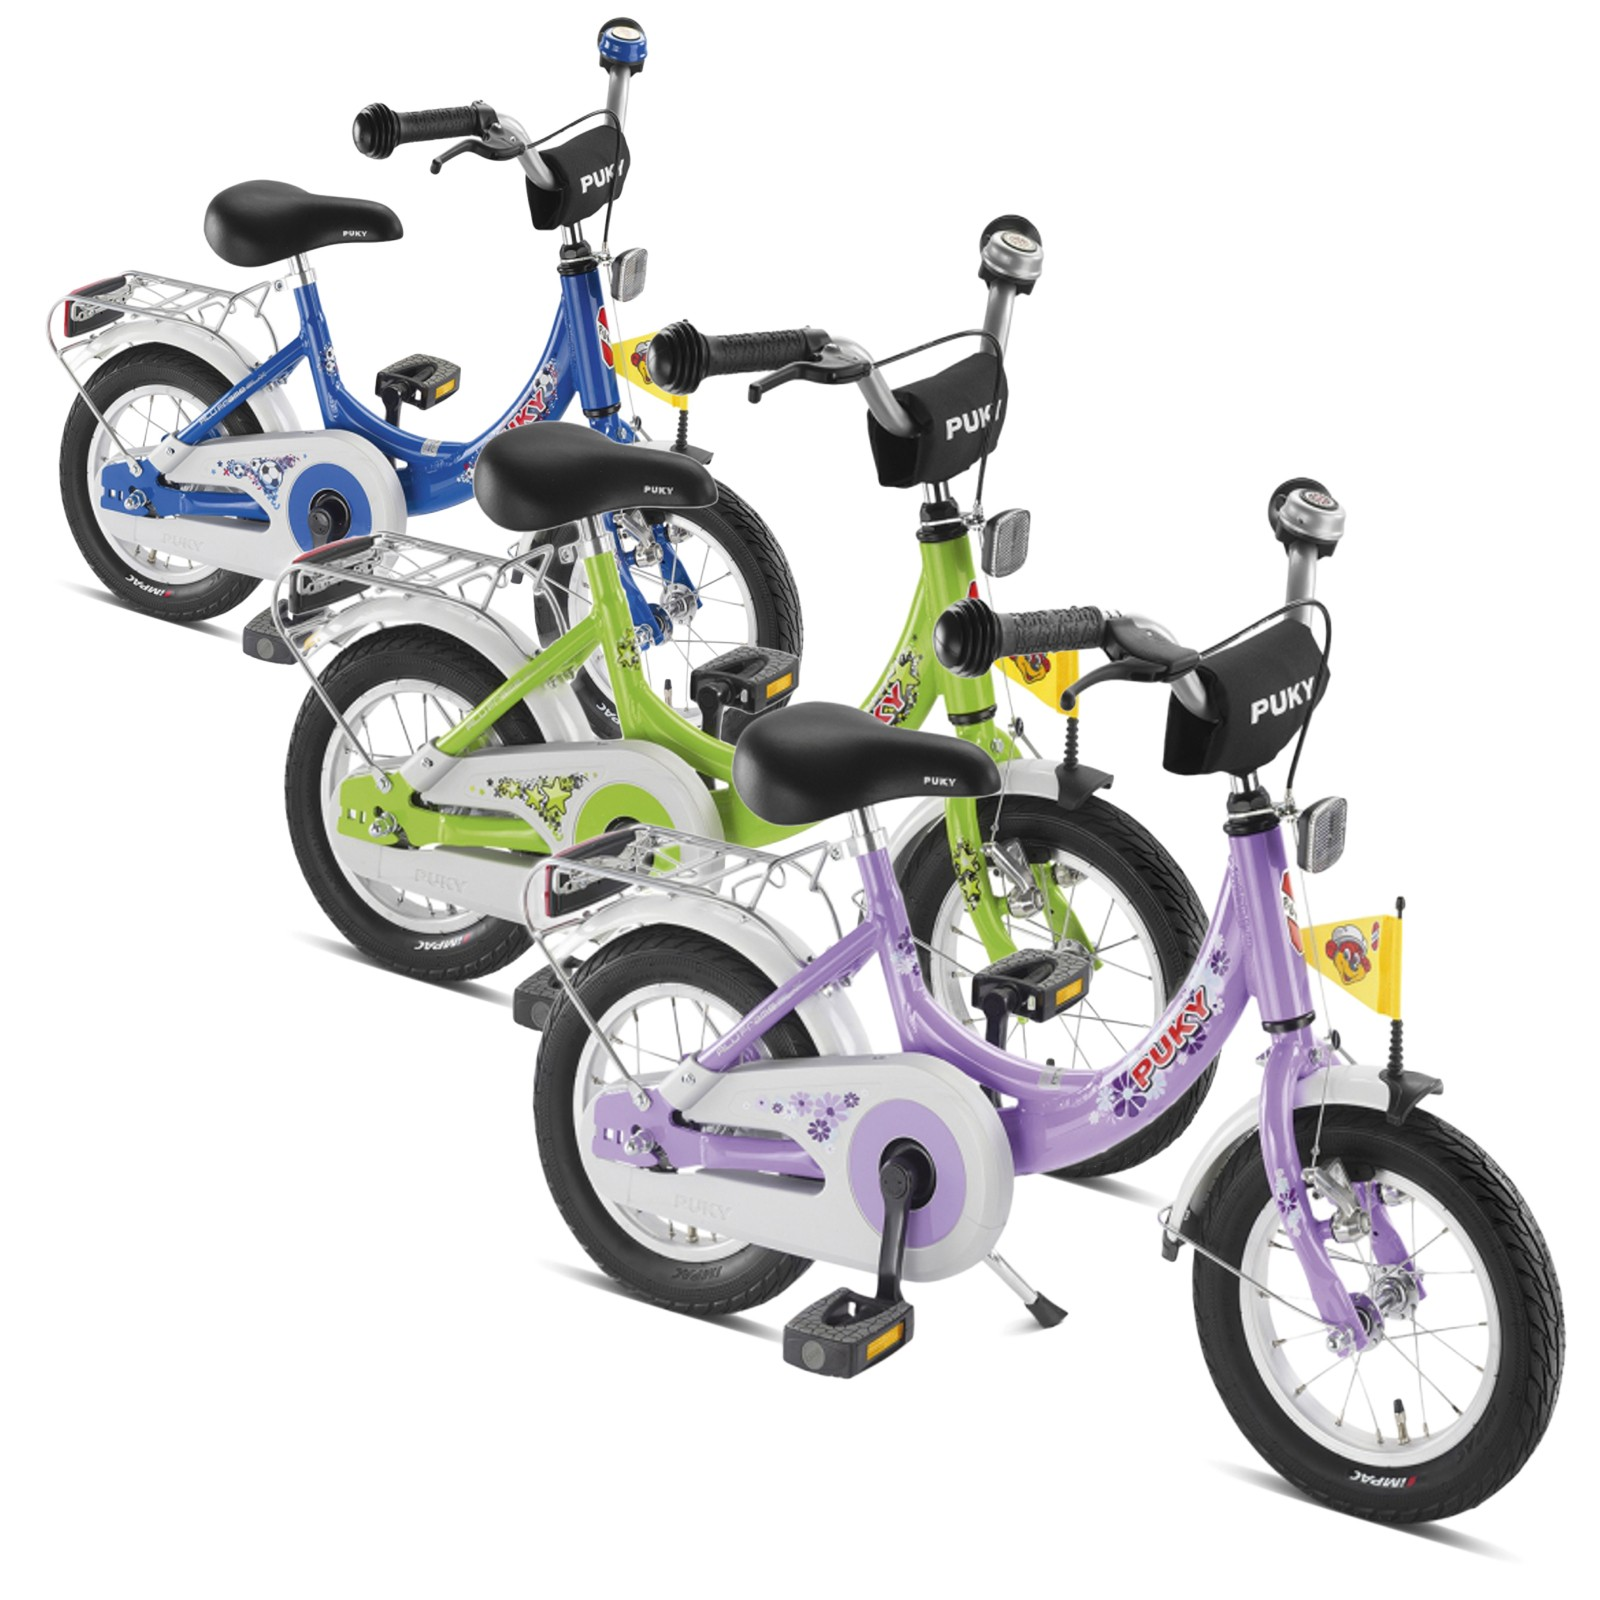 puky fahrrad 12 zoll flieder ersatzteile zu dem fahrrad. Black Bedroom Furniture Sets. Home Design Ideas